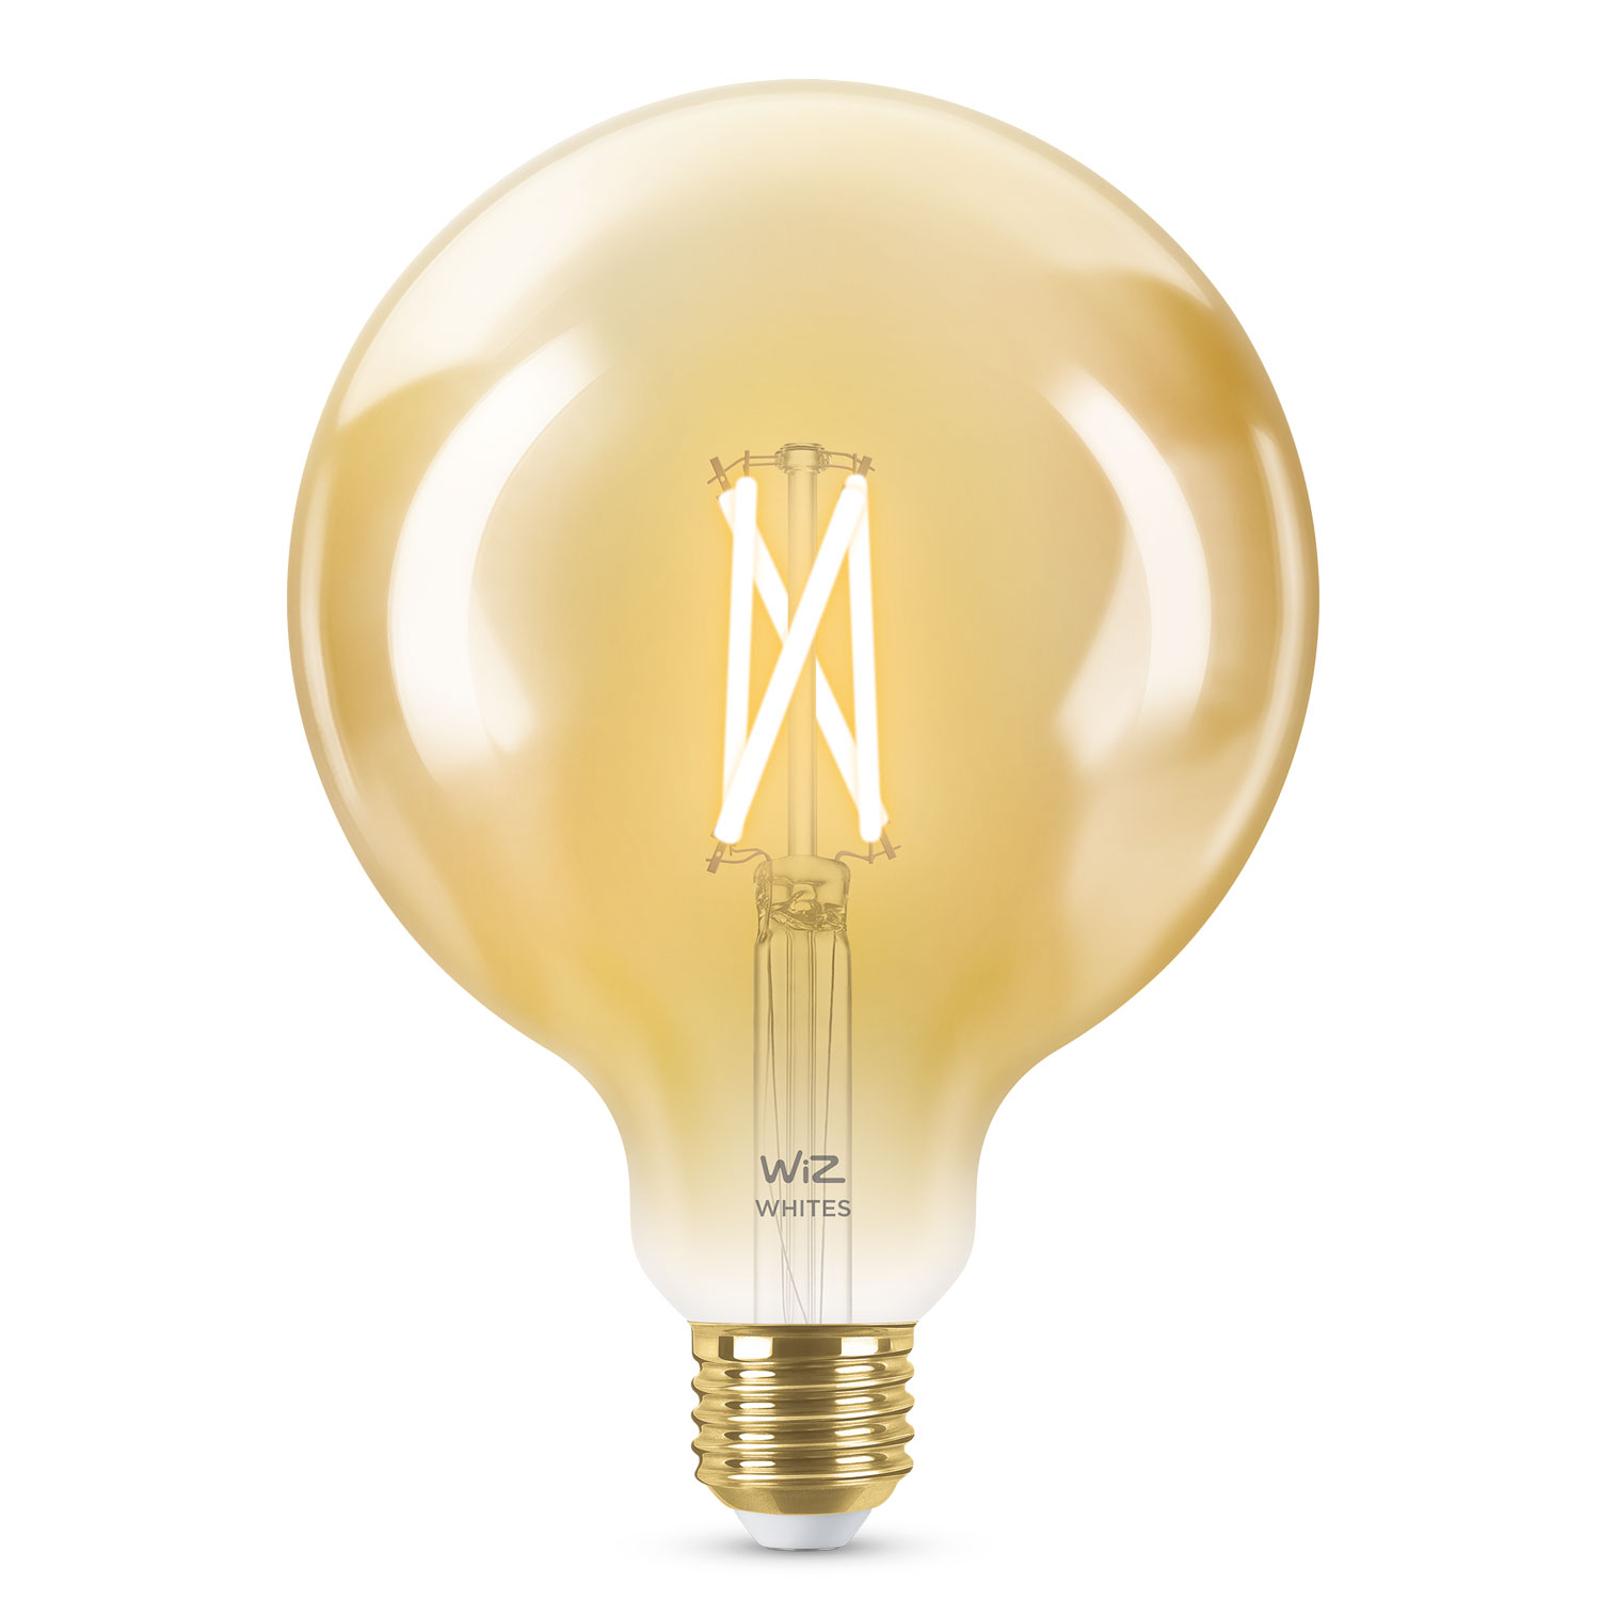 WiZ E27 LED G125 filament ambre 6,5W 2000-4500K